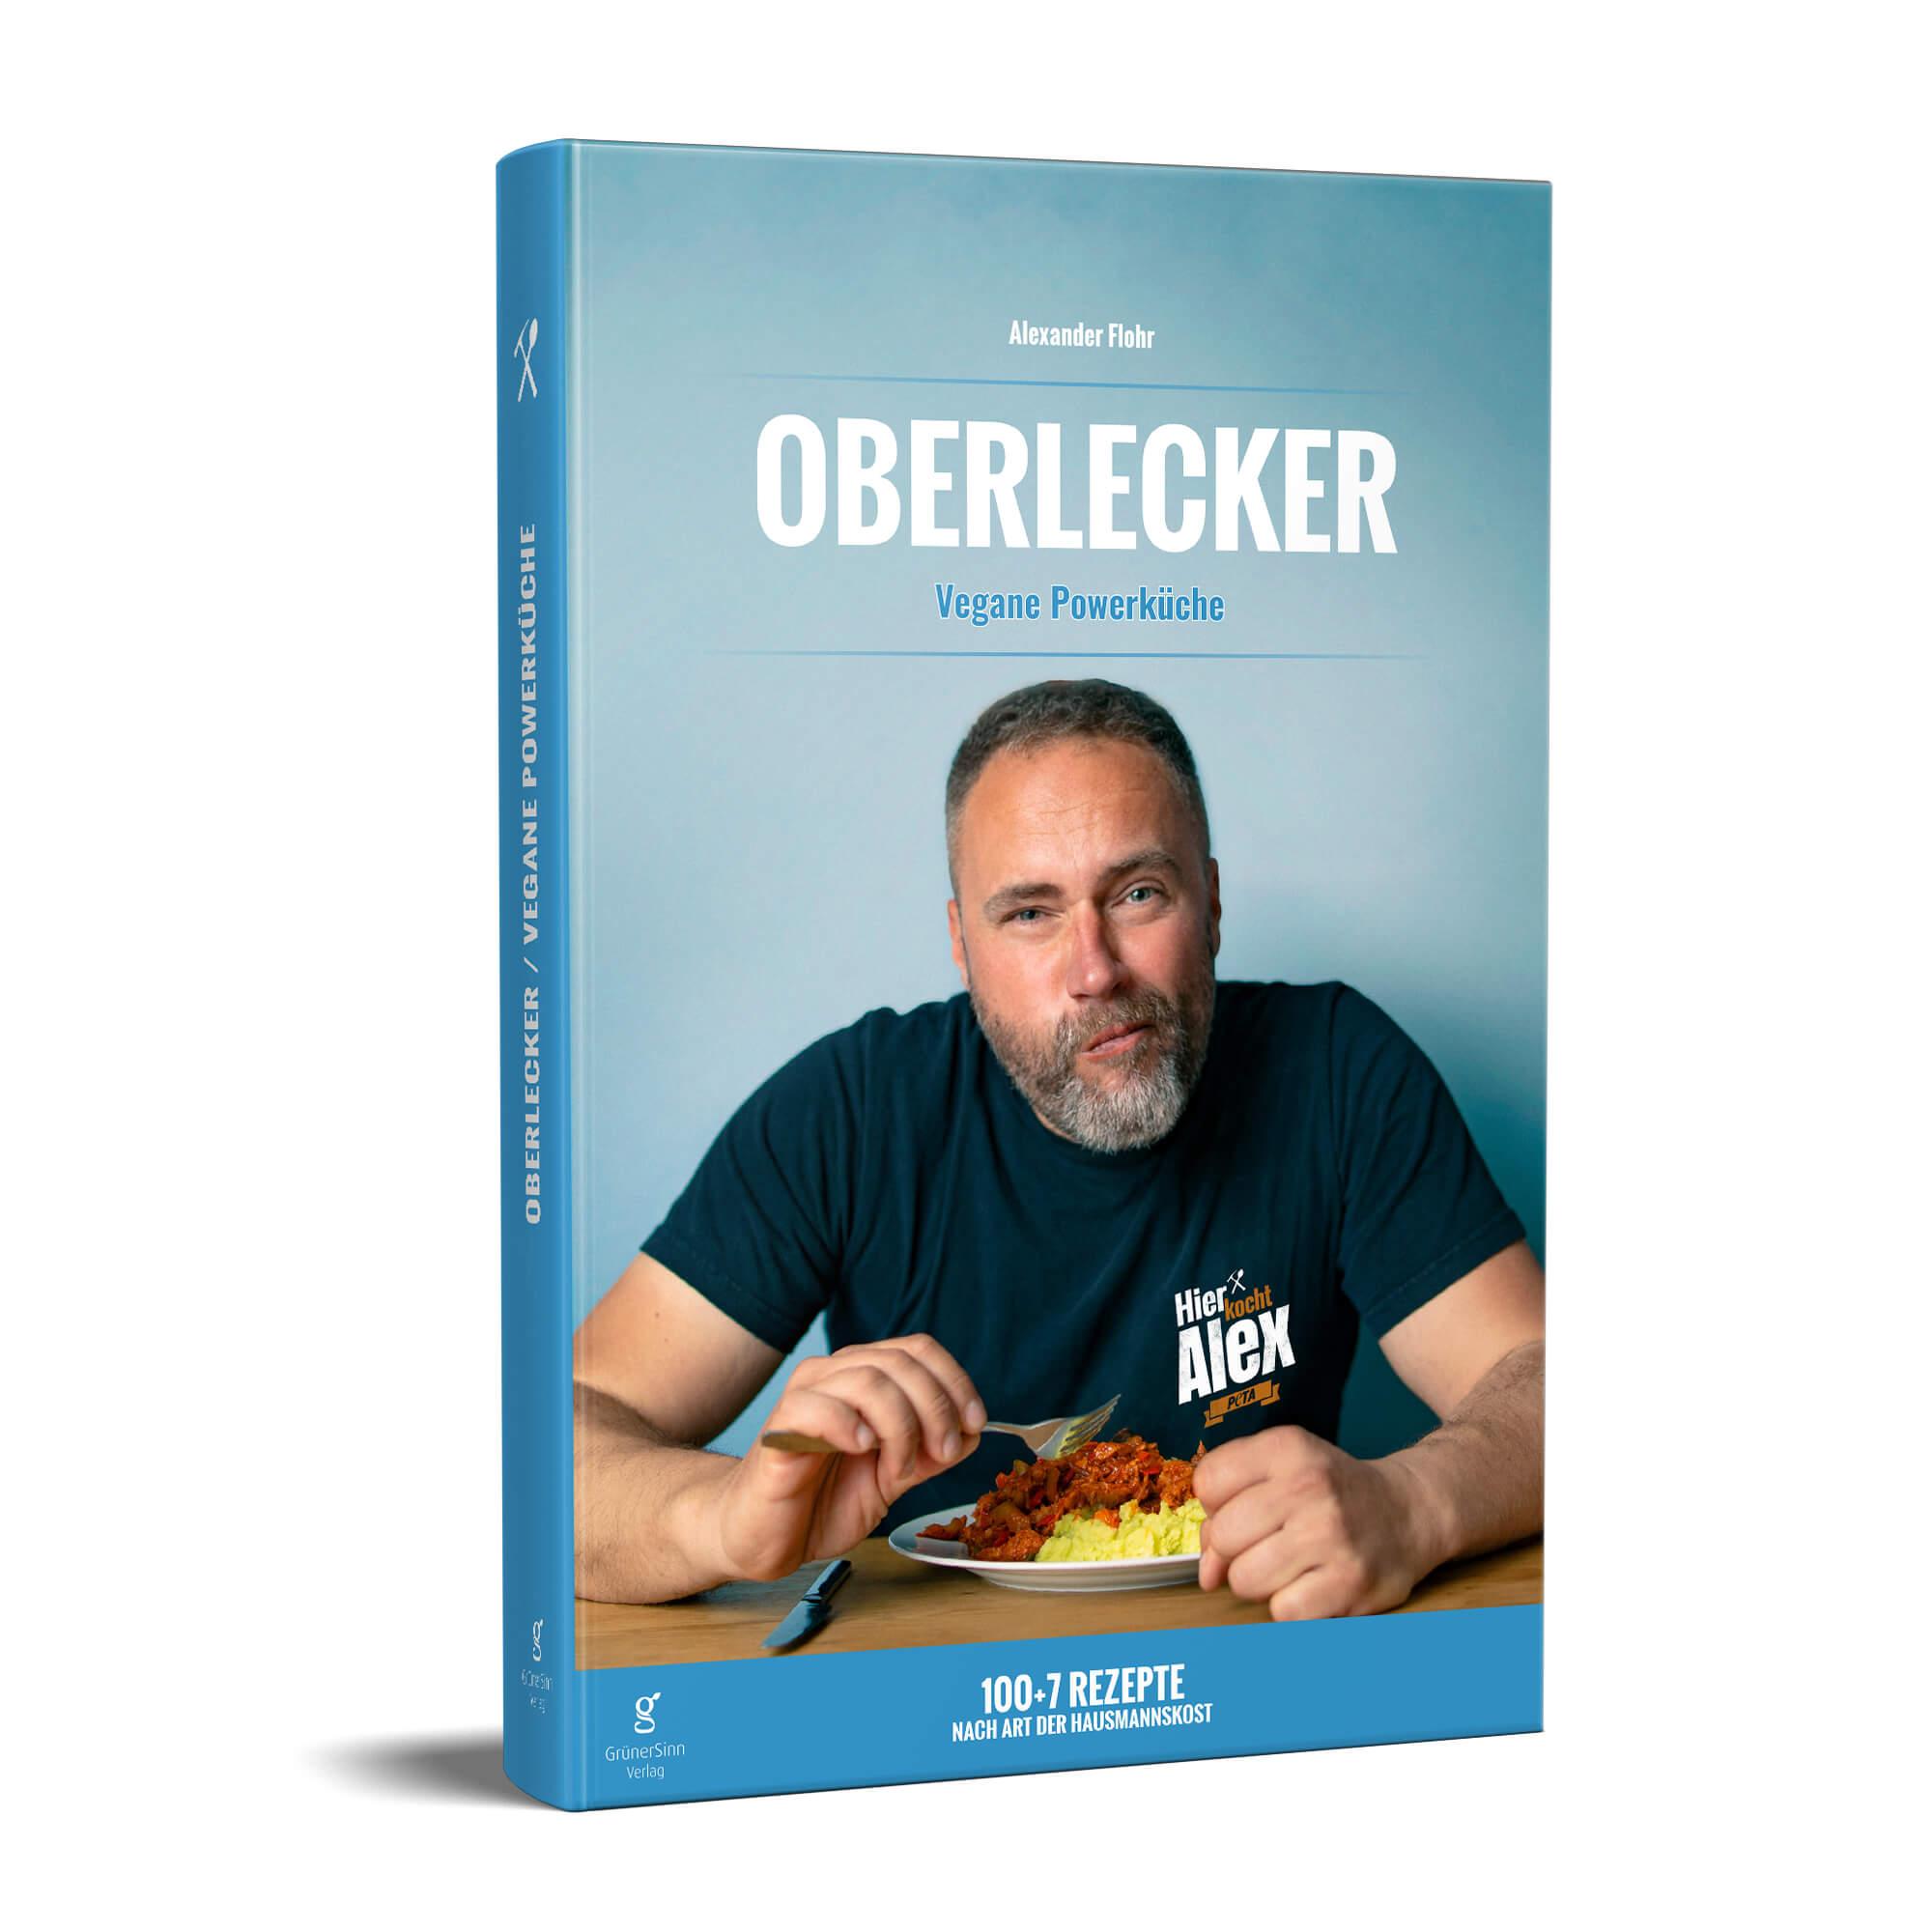 Mockup-Oberlecker_1209